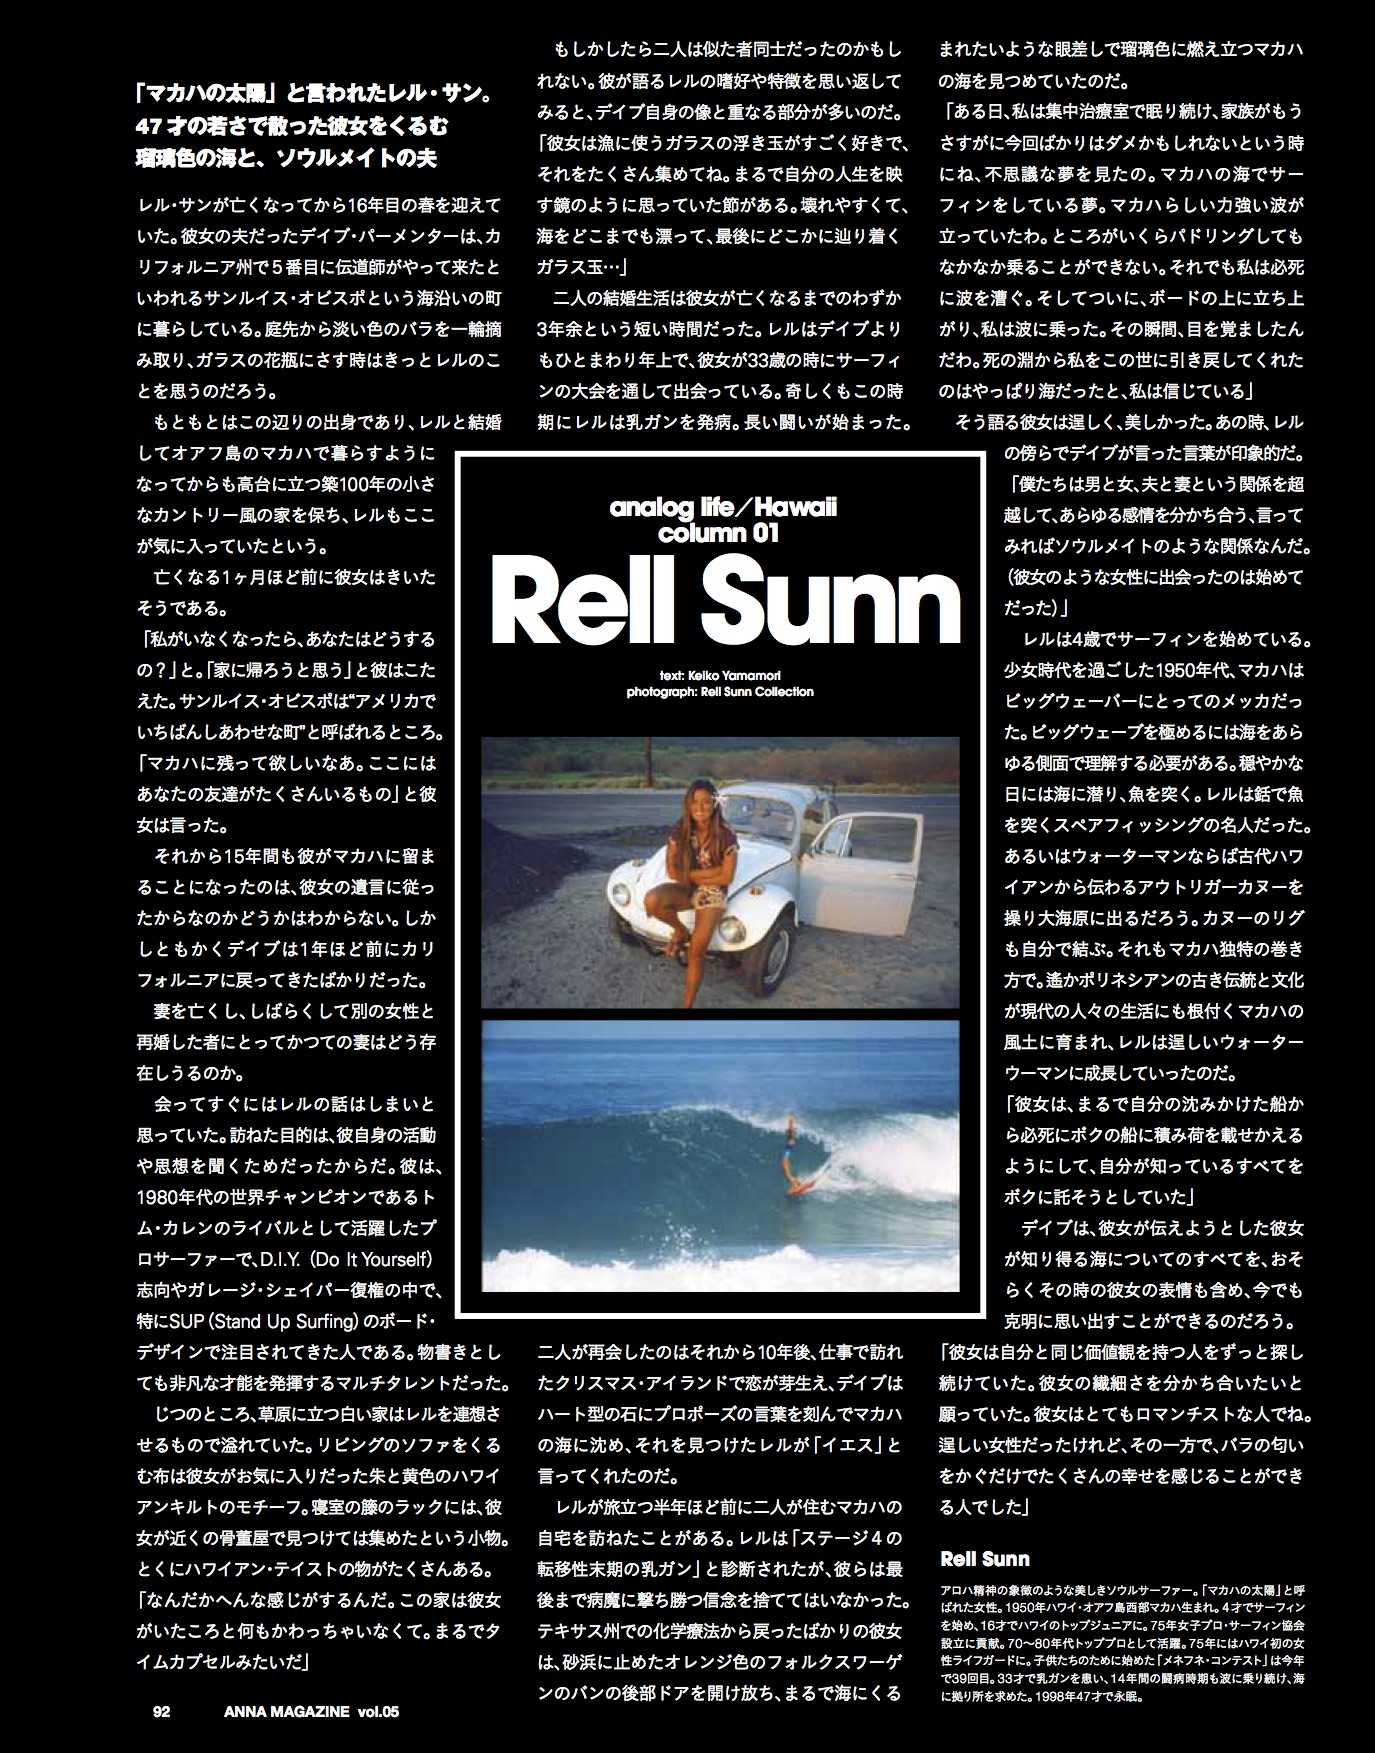 anna magazine Vol.5 P25